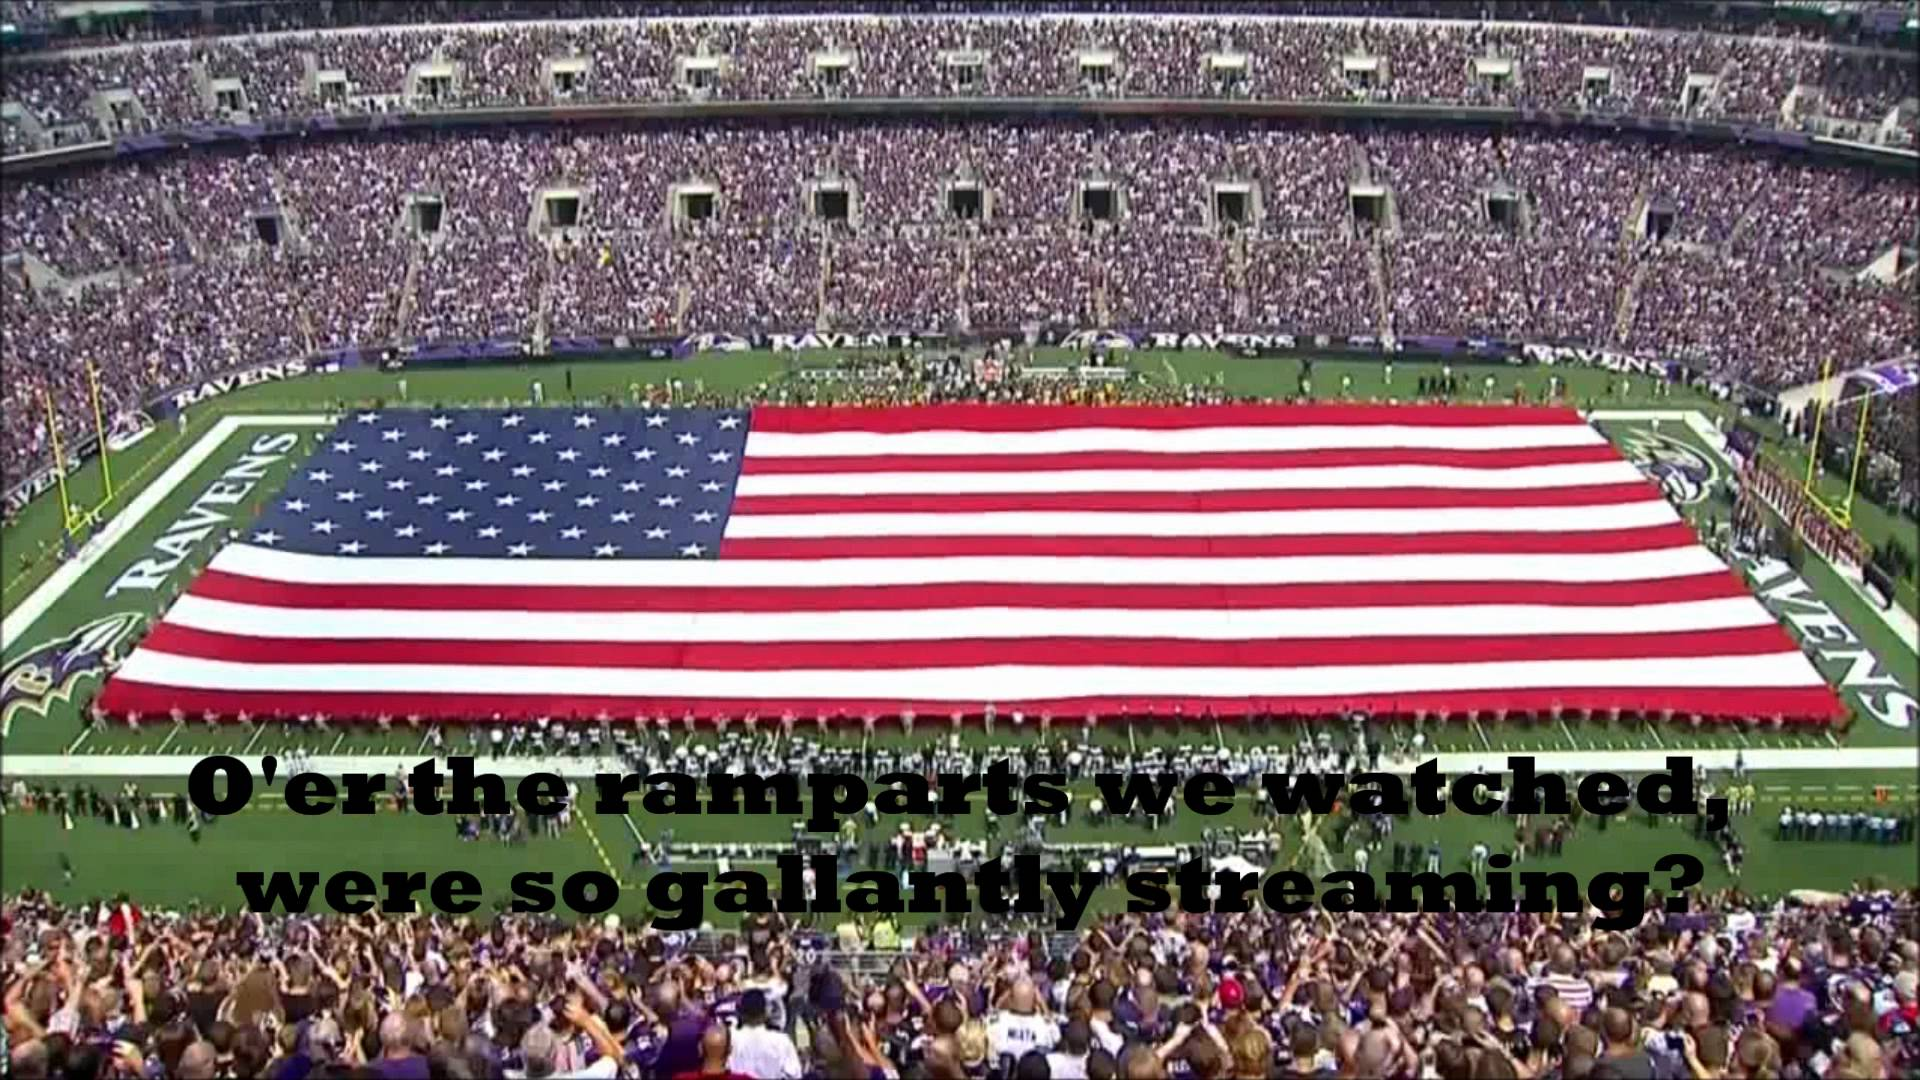 National Anthem Lyrics Of USA